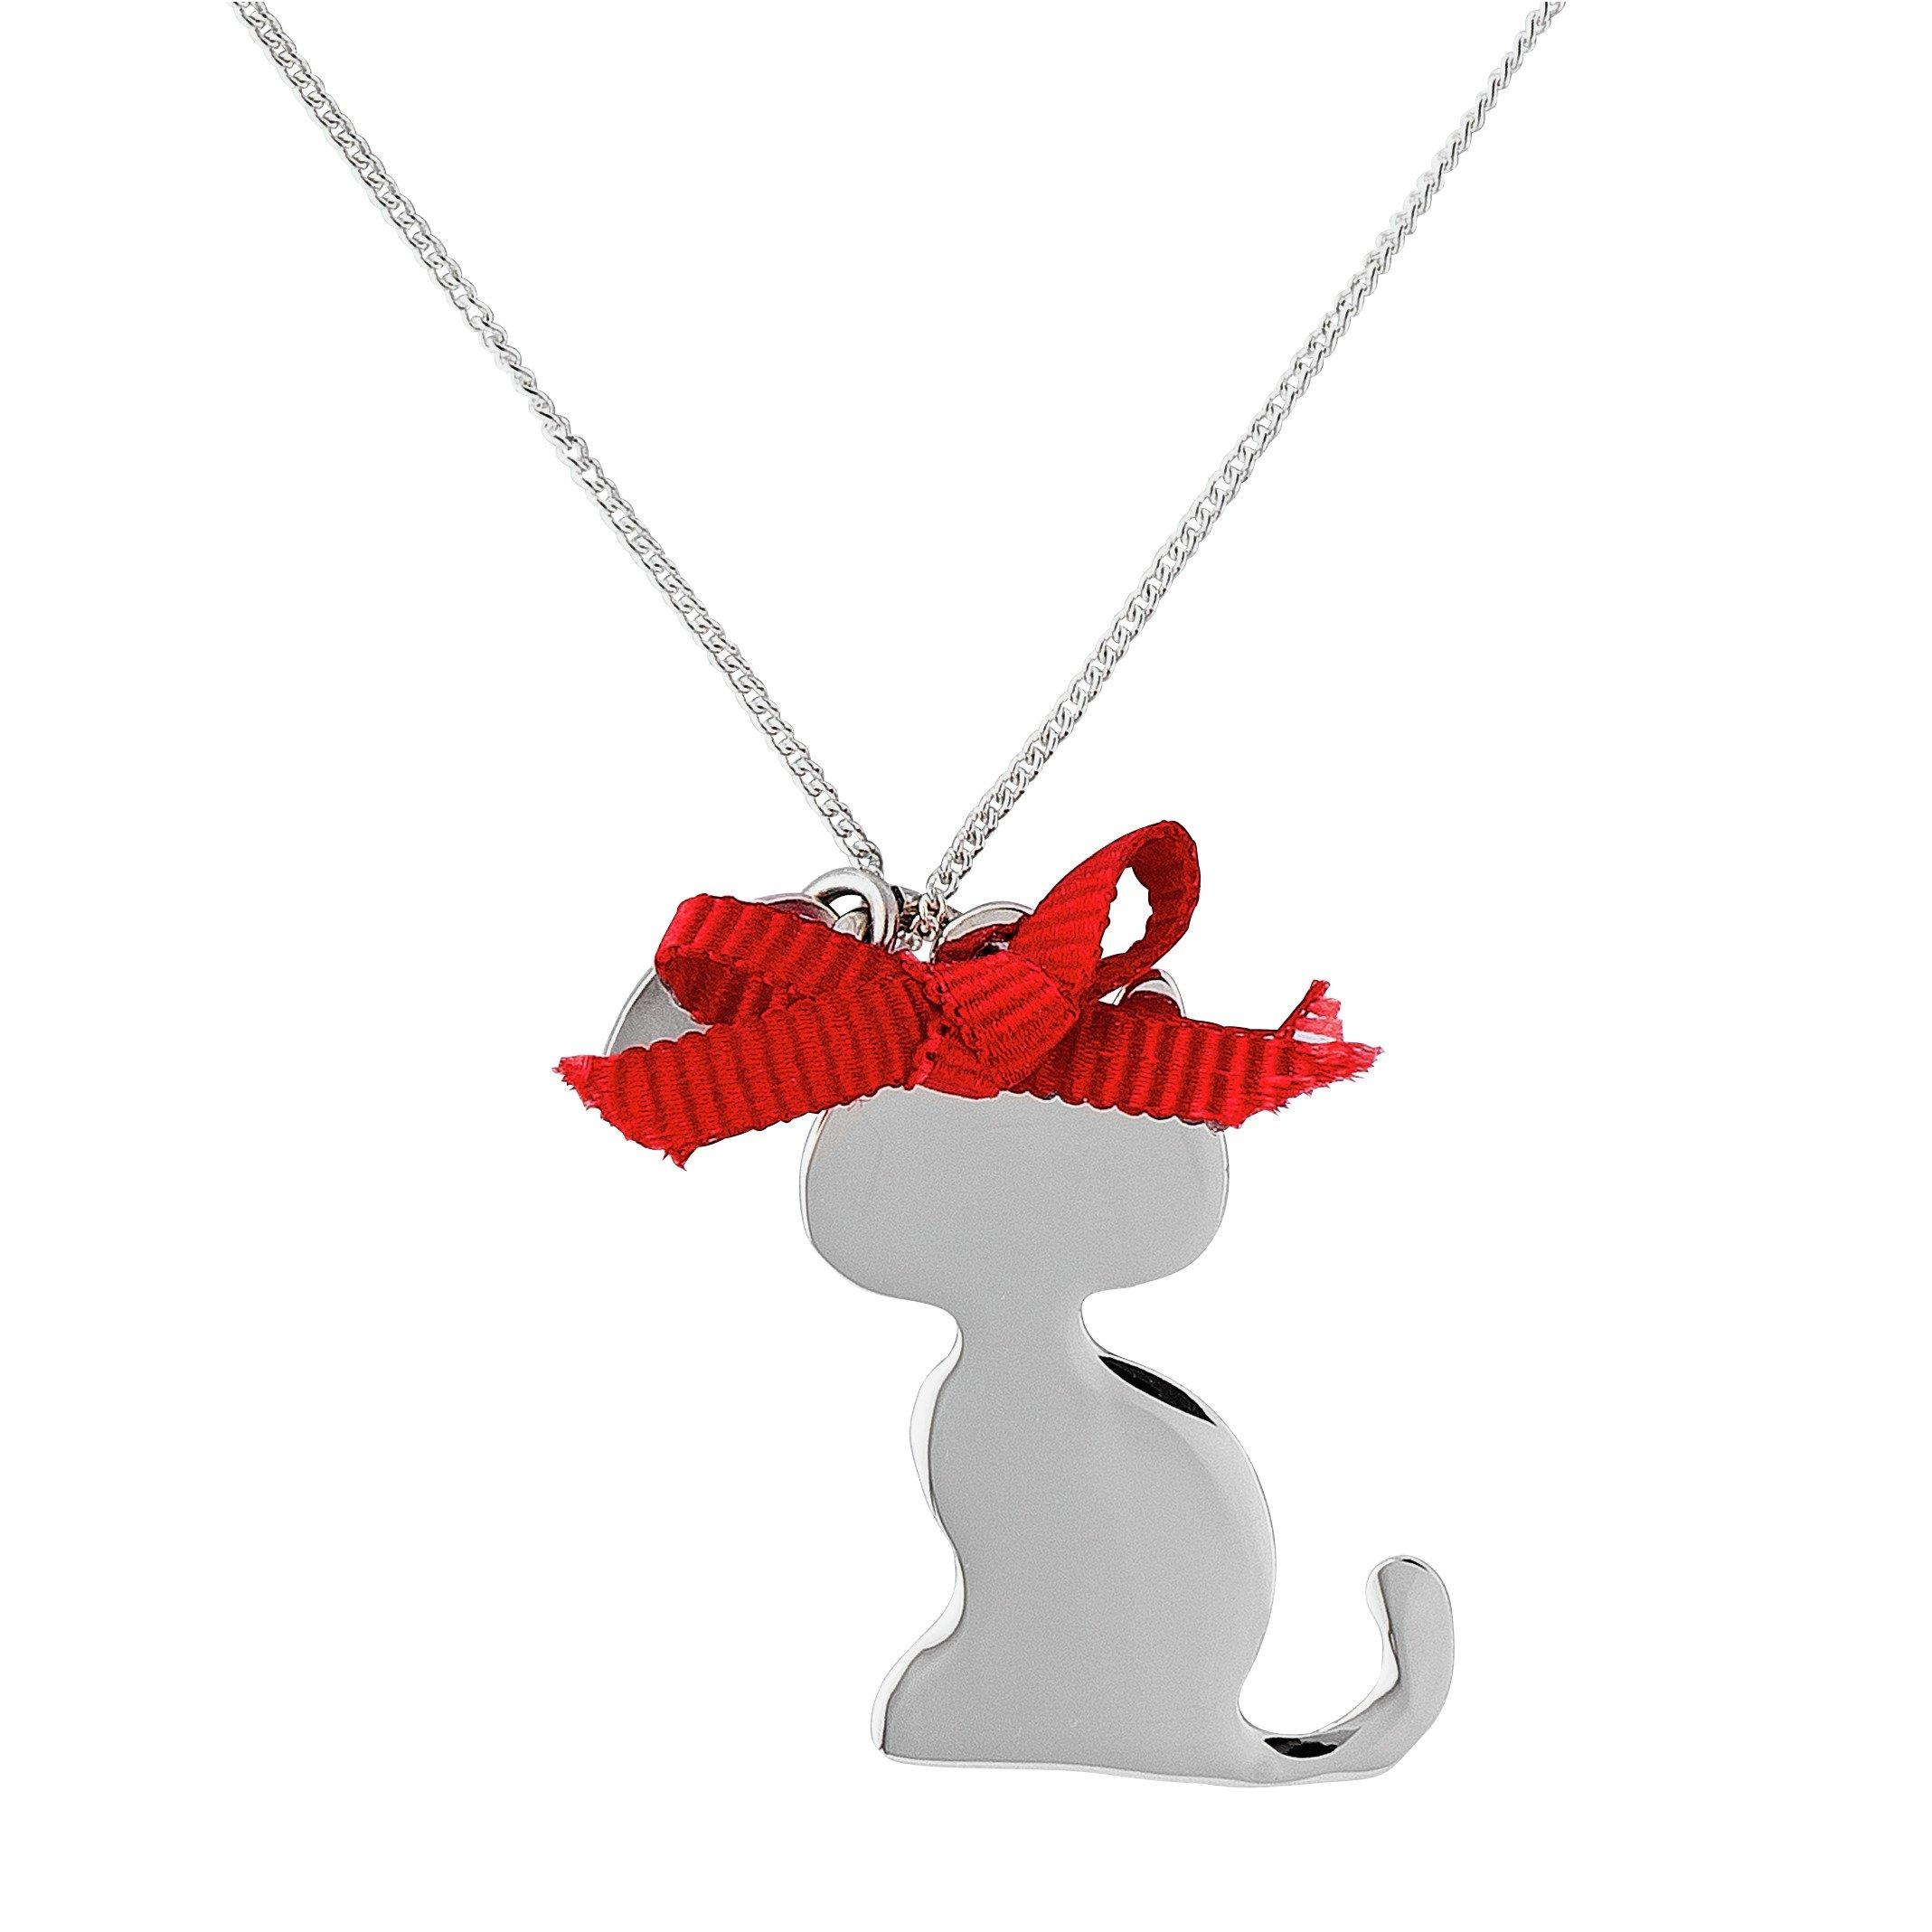 Image of Revere Sterling Silver Cat Pendant